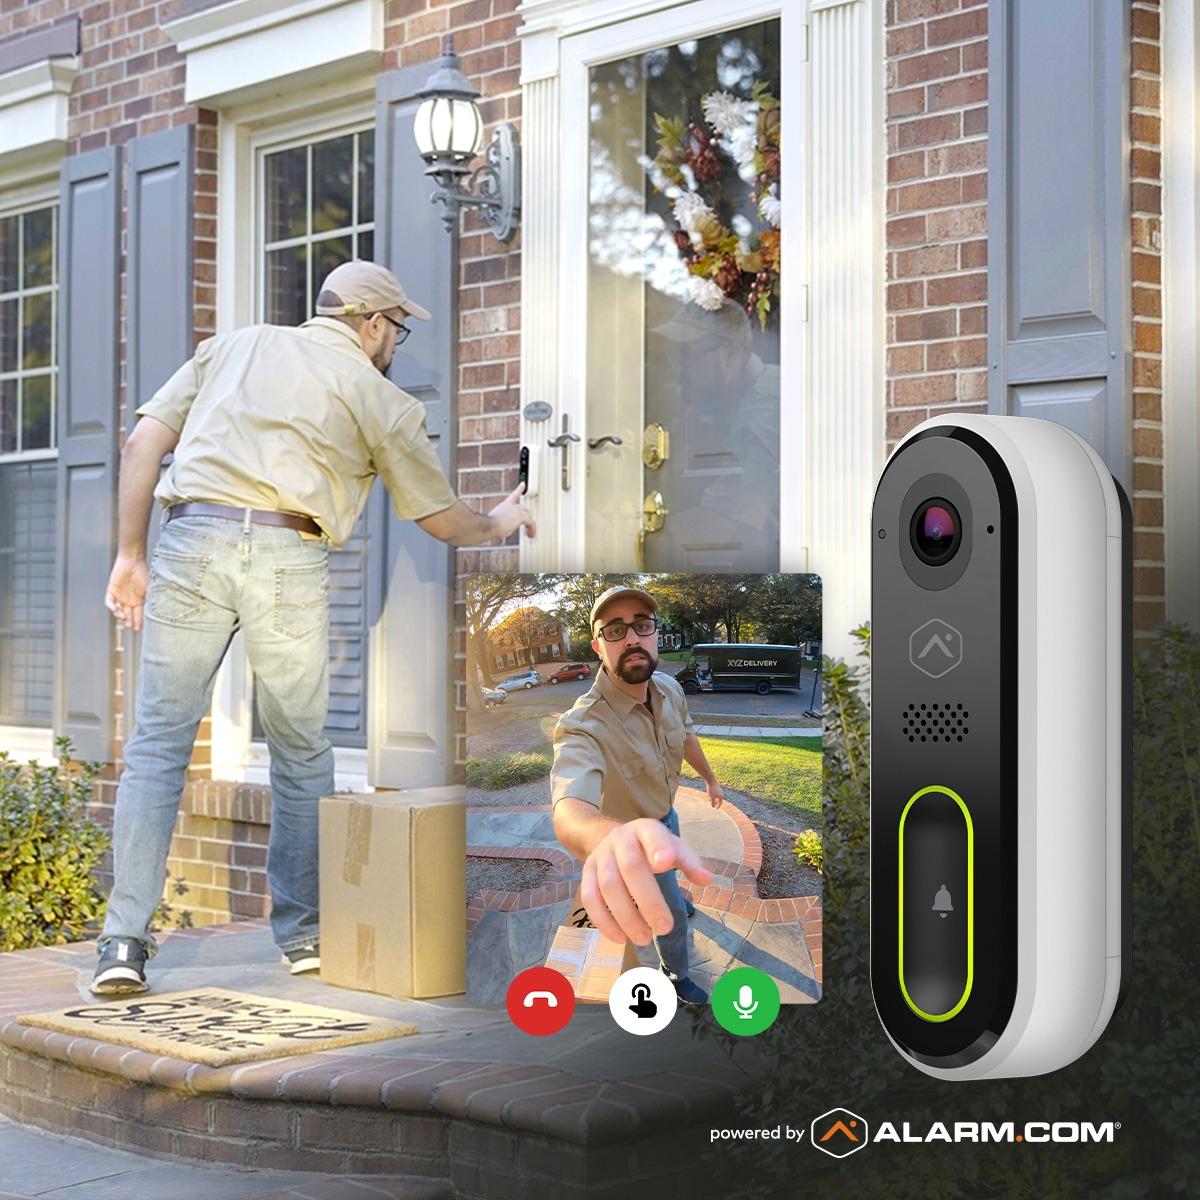 ups usps fedex driver using Amherst Alarm video doorbell alarm.com